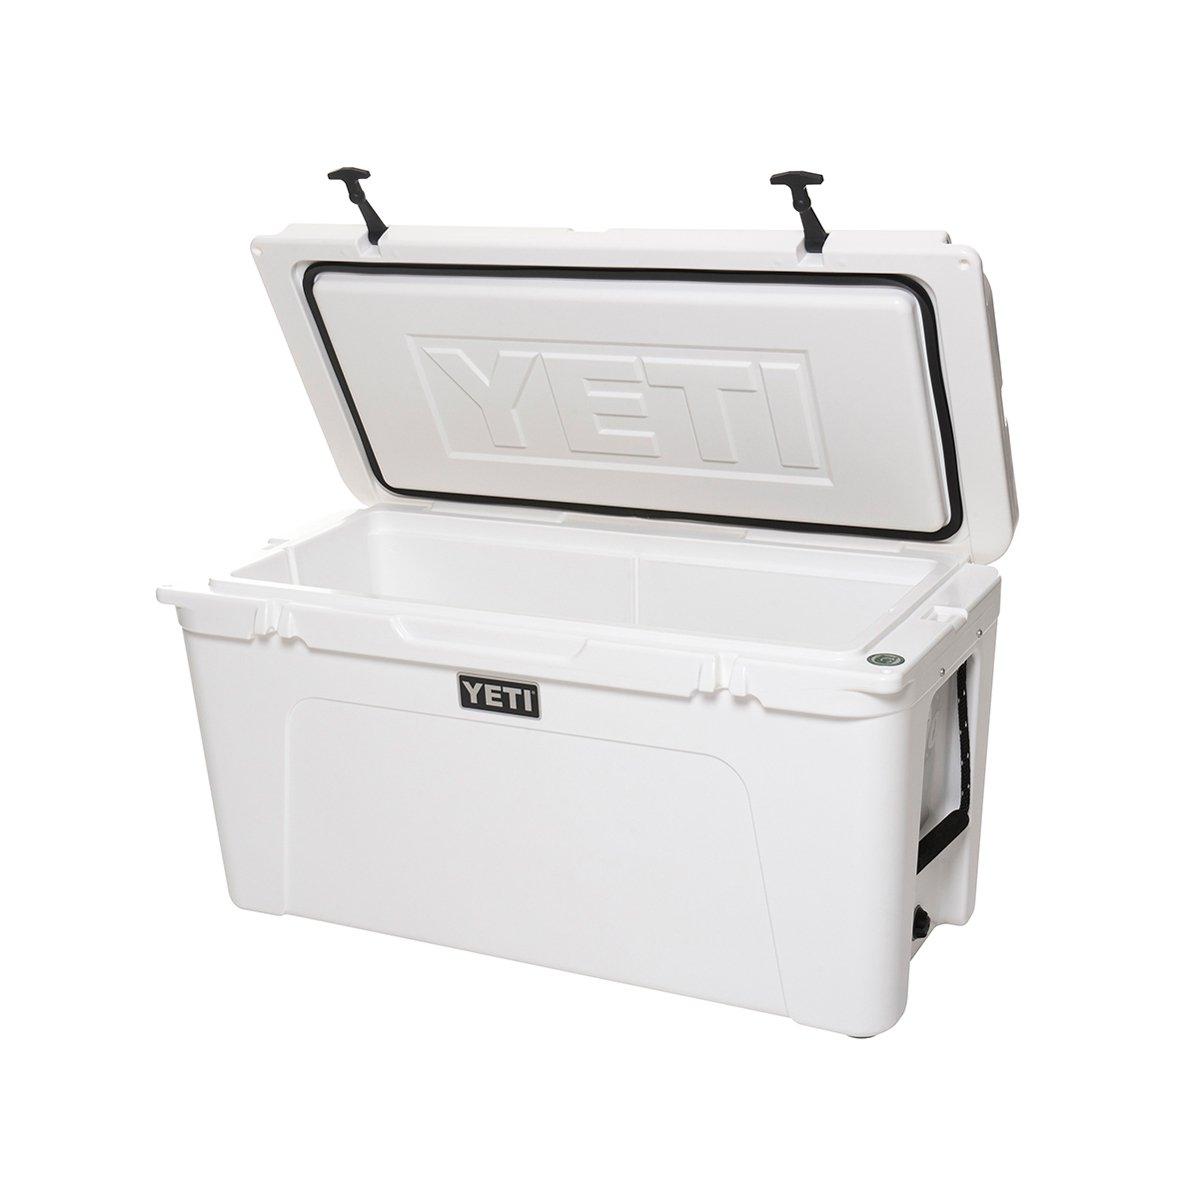 Yeti Tundra Boat Cooler